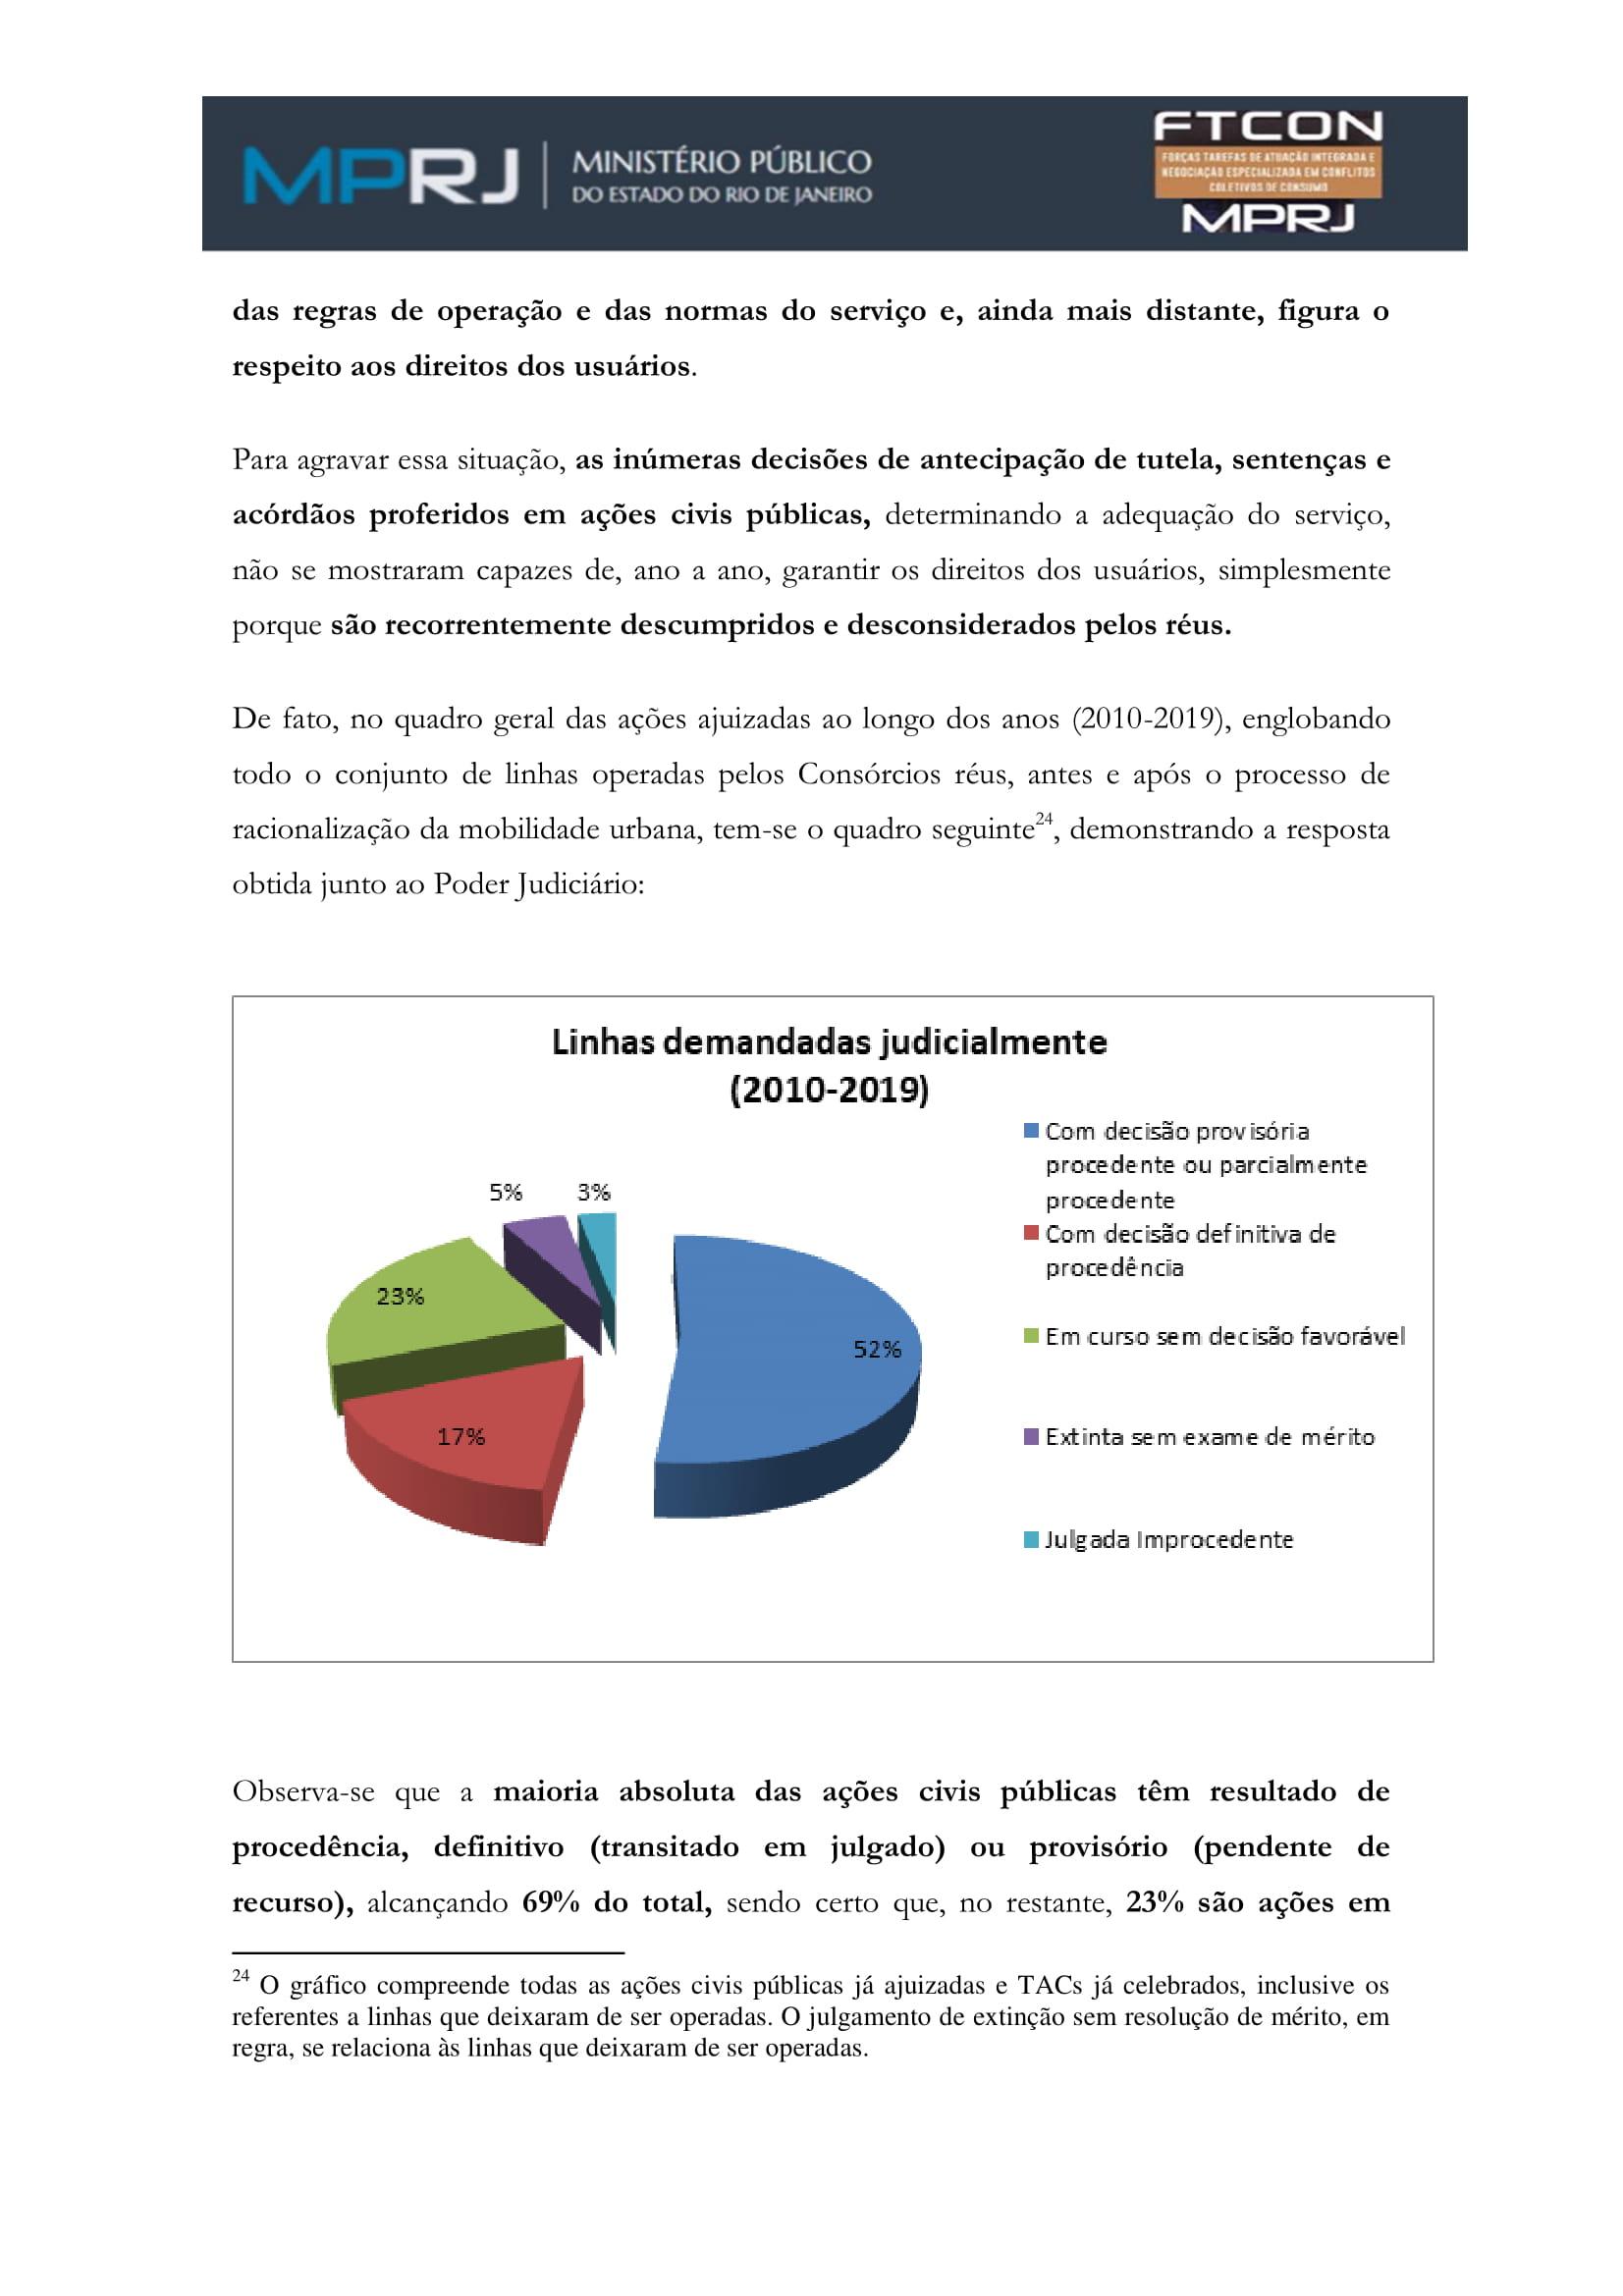 acp_caducidade_onibus_dr_rt-025